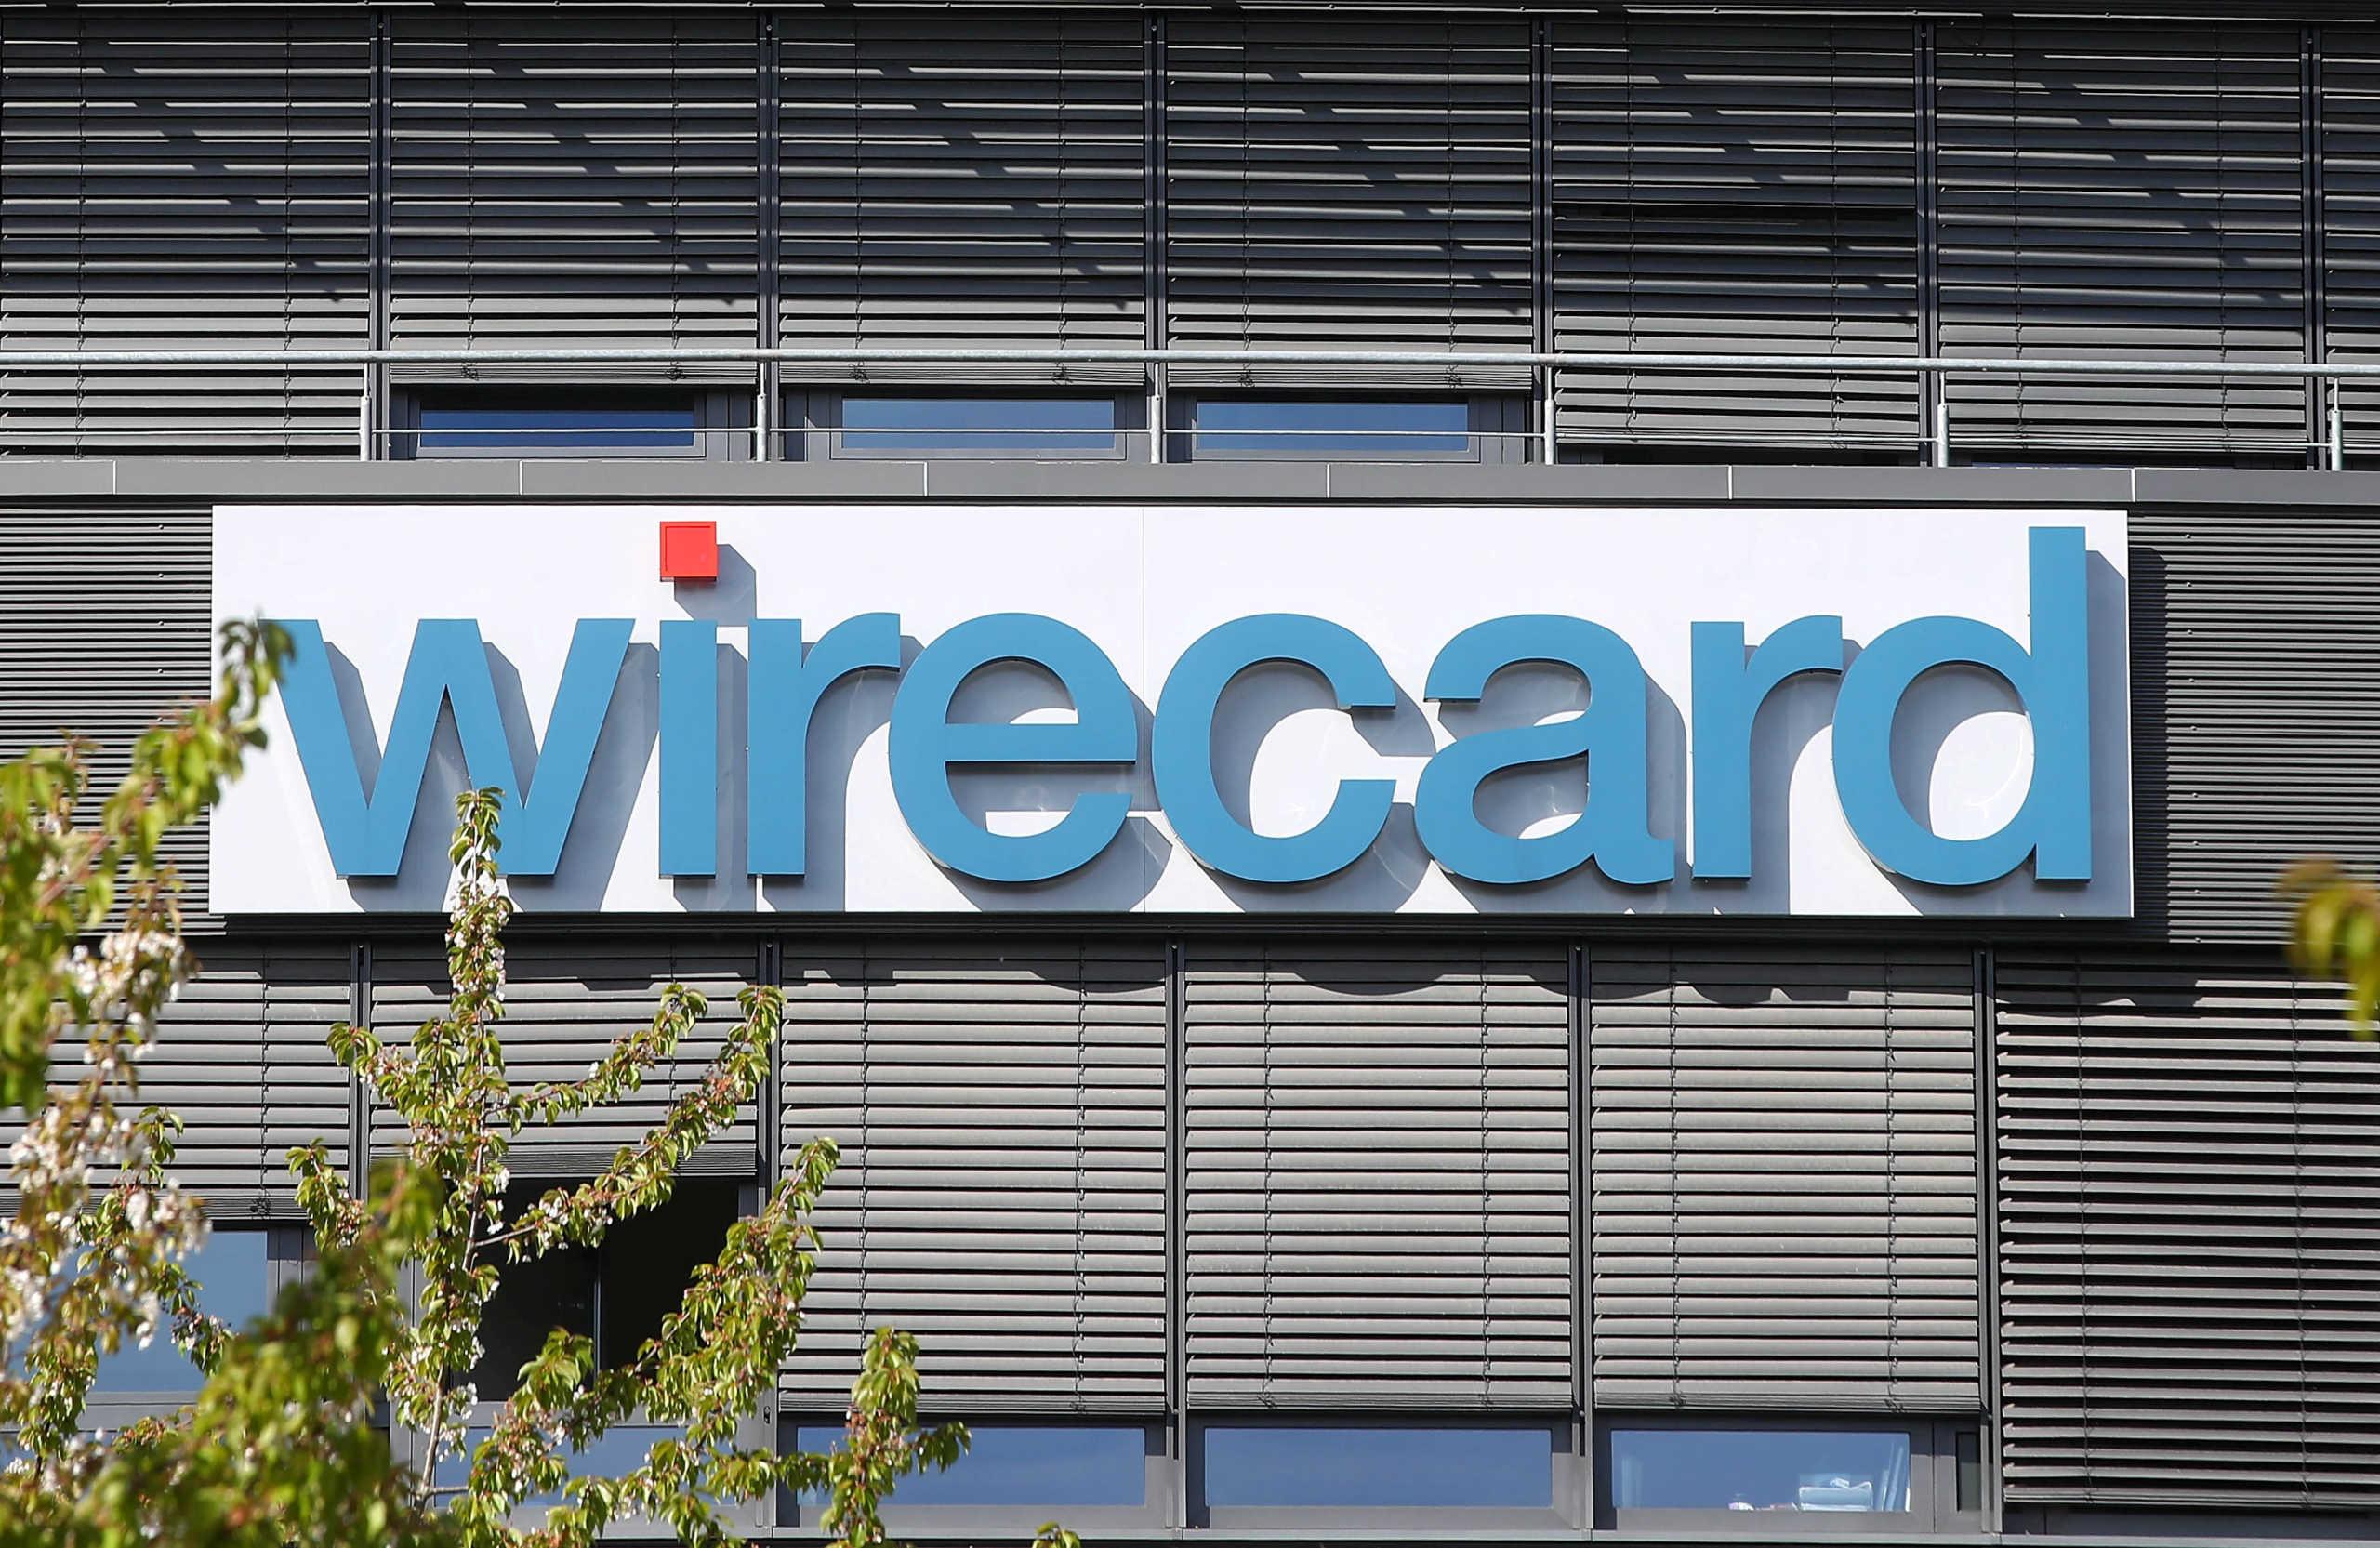 Wirecard: Τεράστιο σκάνδαλο συνταράσσει τη Γερμανία με «εξαφάνιση» 1,9 δισ. ευρώ